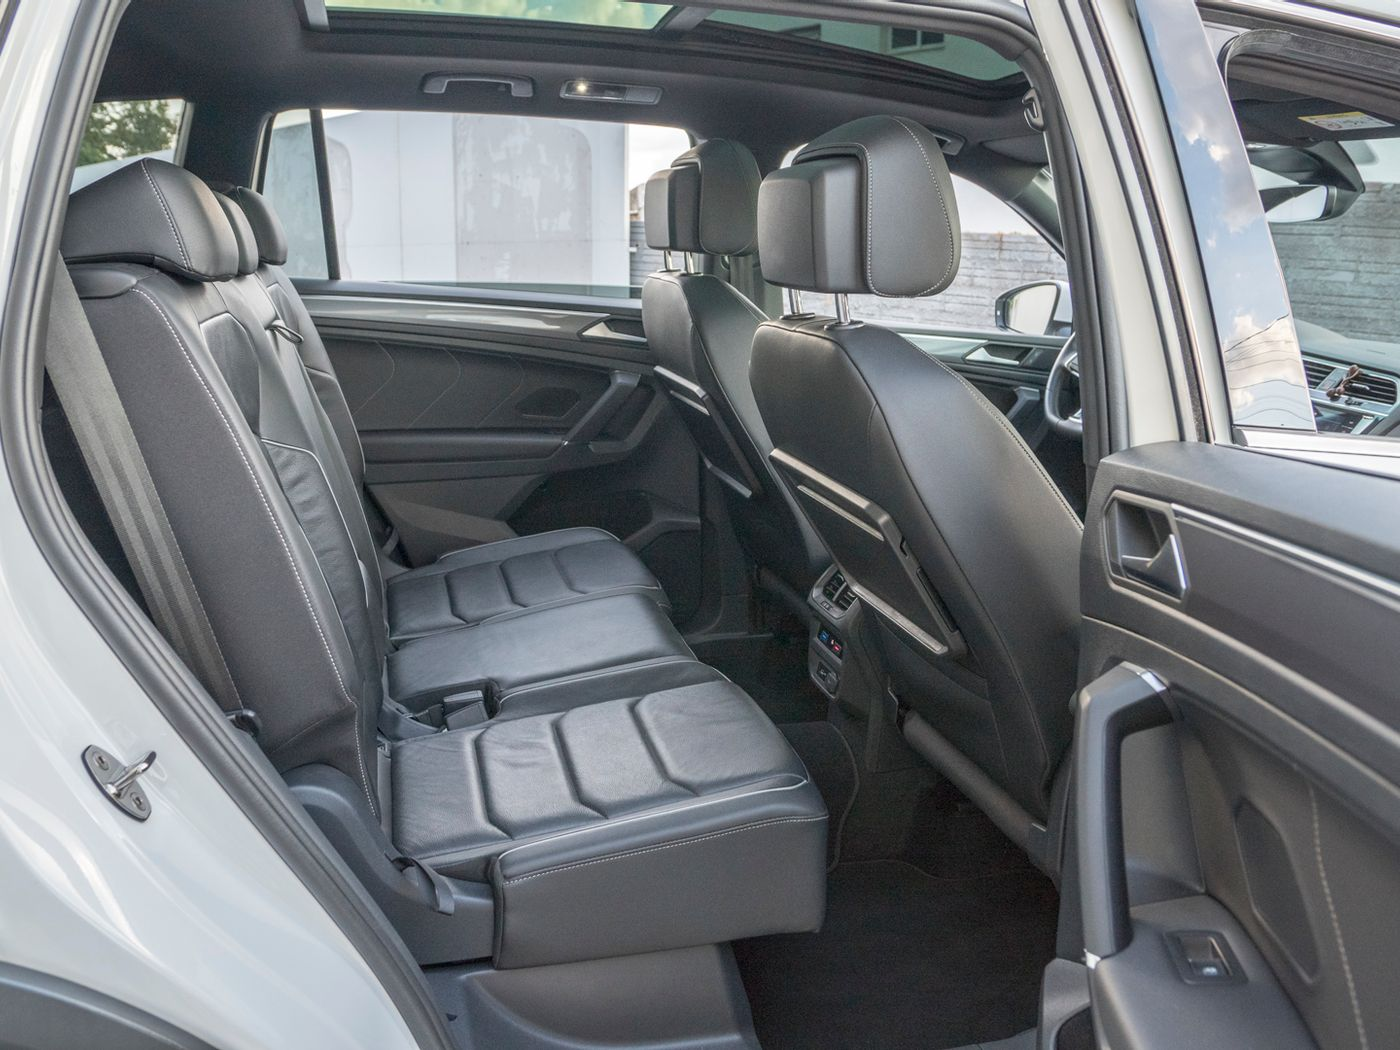 VolksWagen TIGUAN Allspac R-Line 350 TSI 2.0 4x4